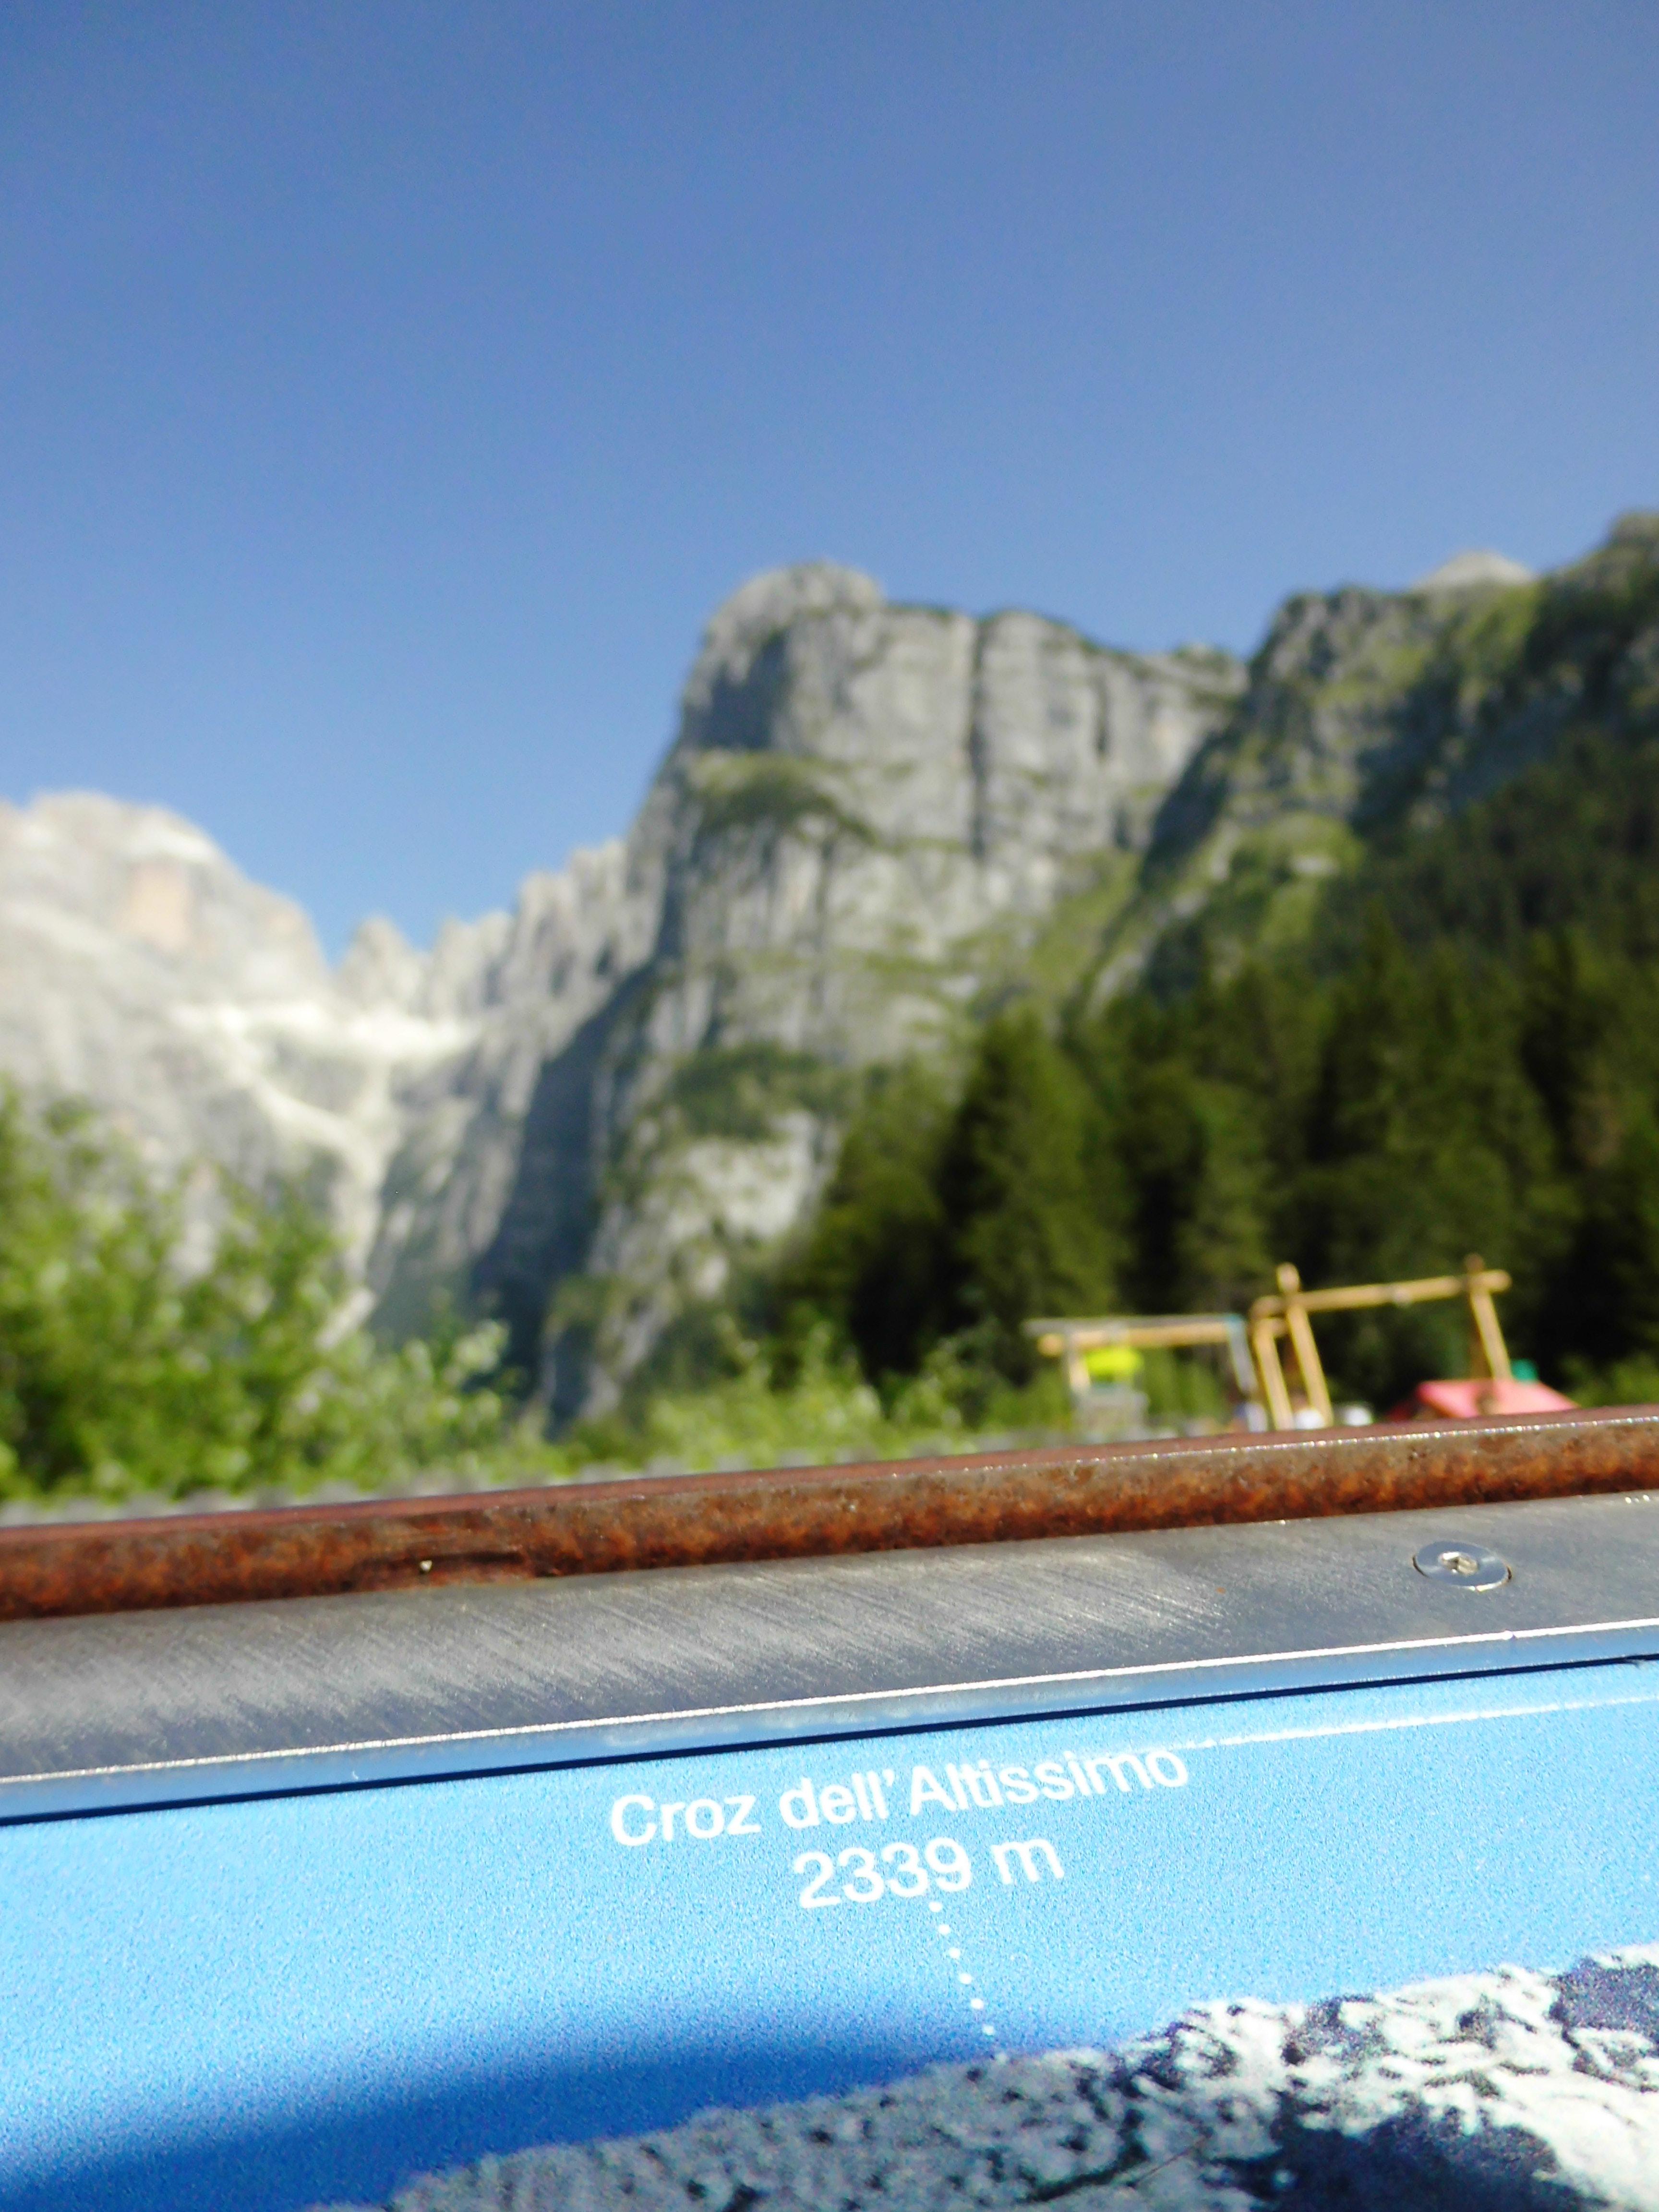 Der Gipfel des Croz de'll Altissimo in den Brenta Dolomiten.